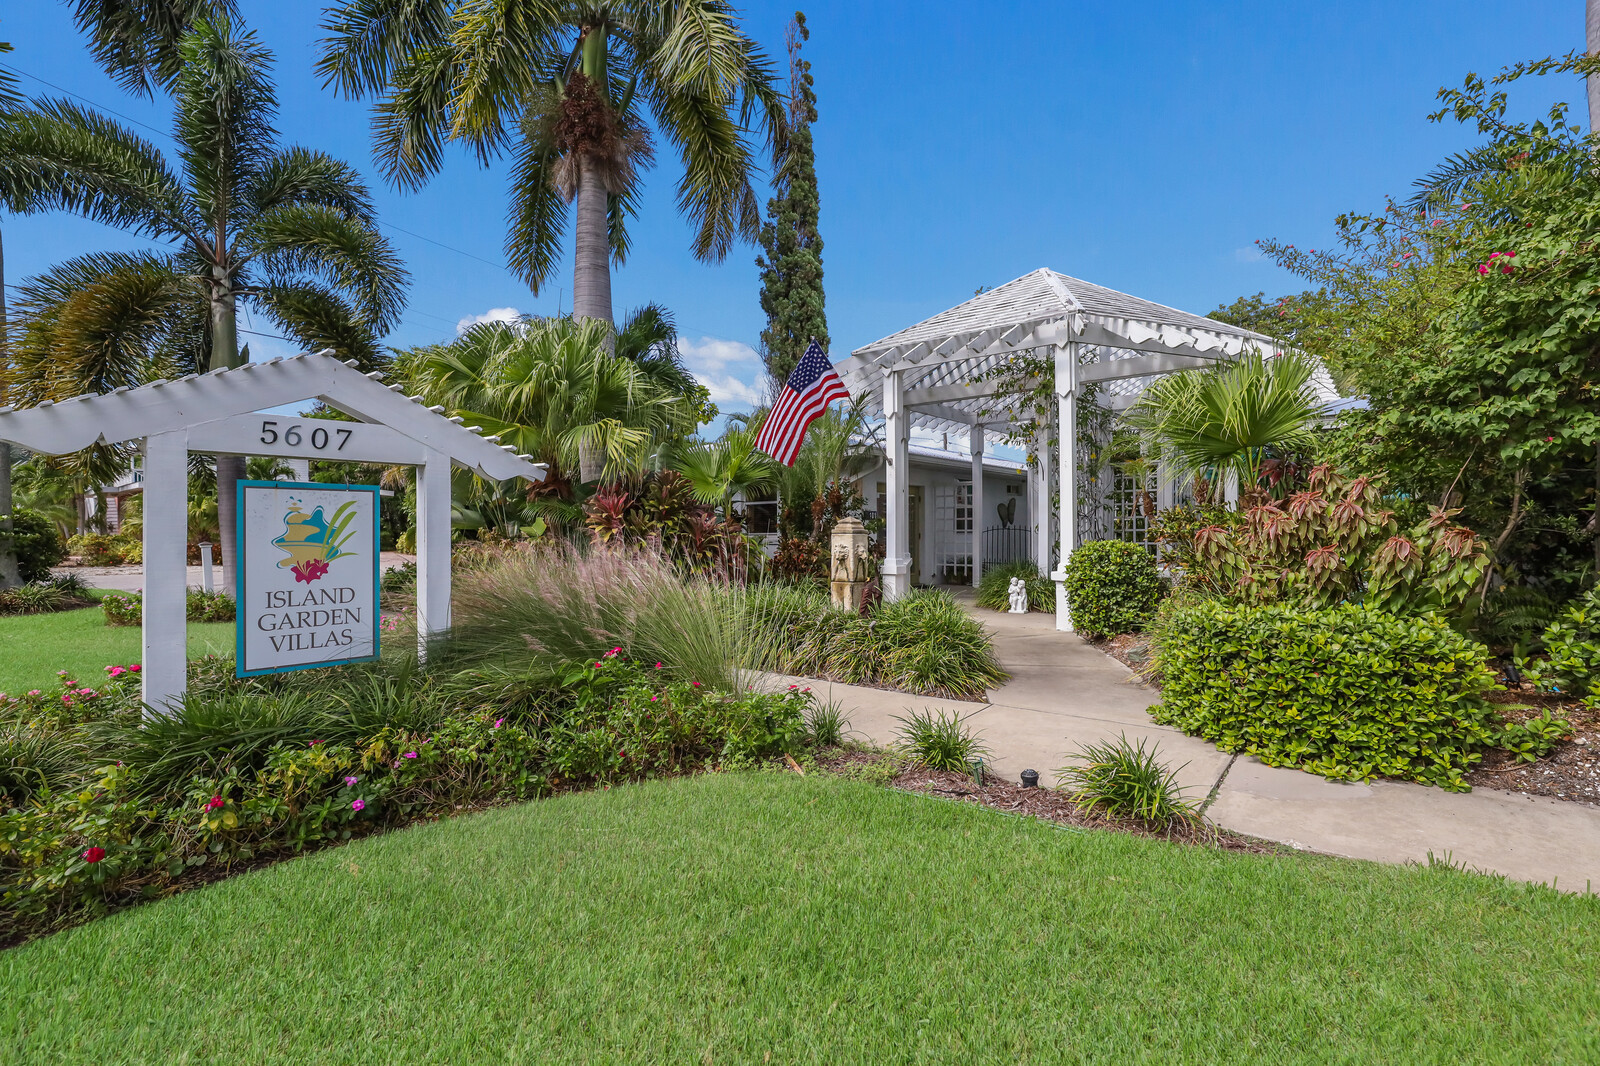 Welcome to Island Garden Villas.jpg